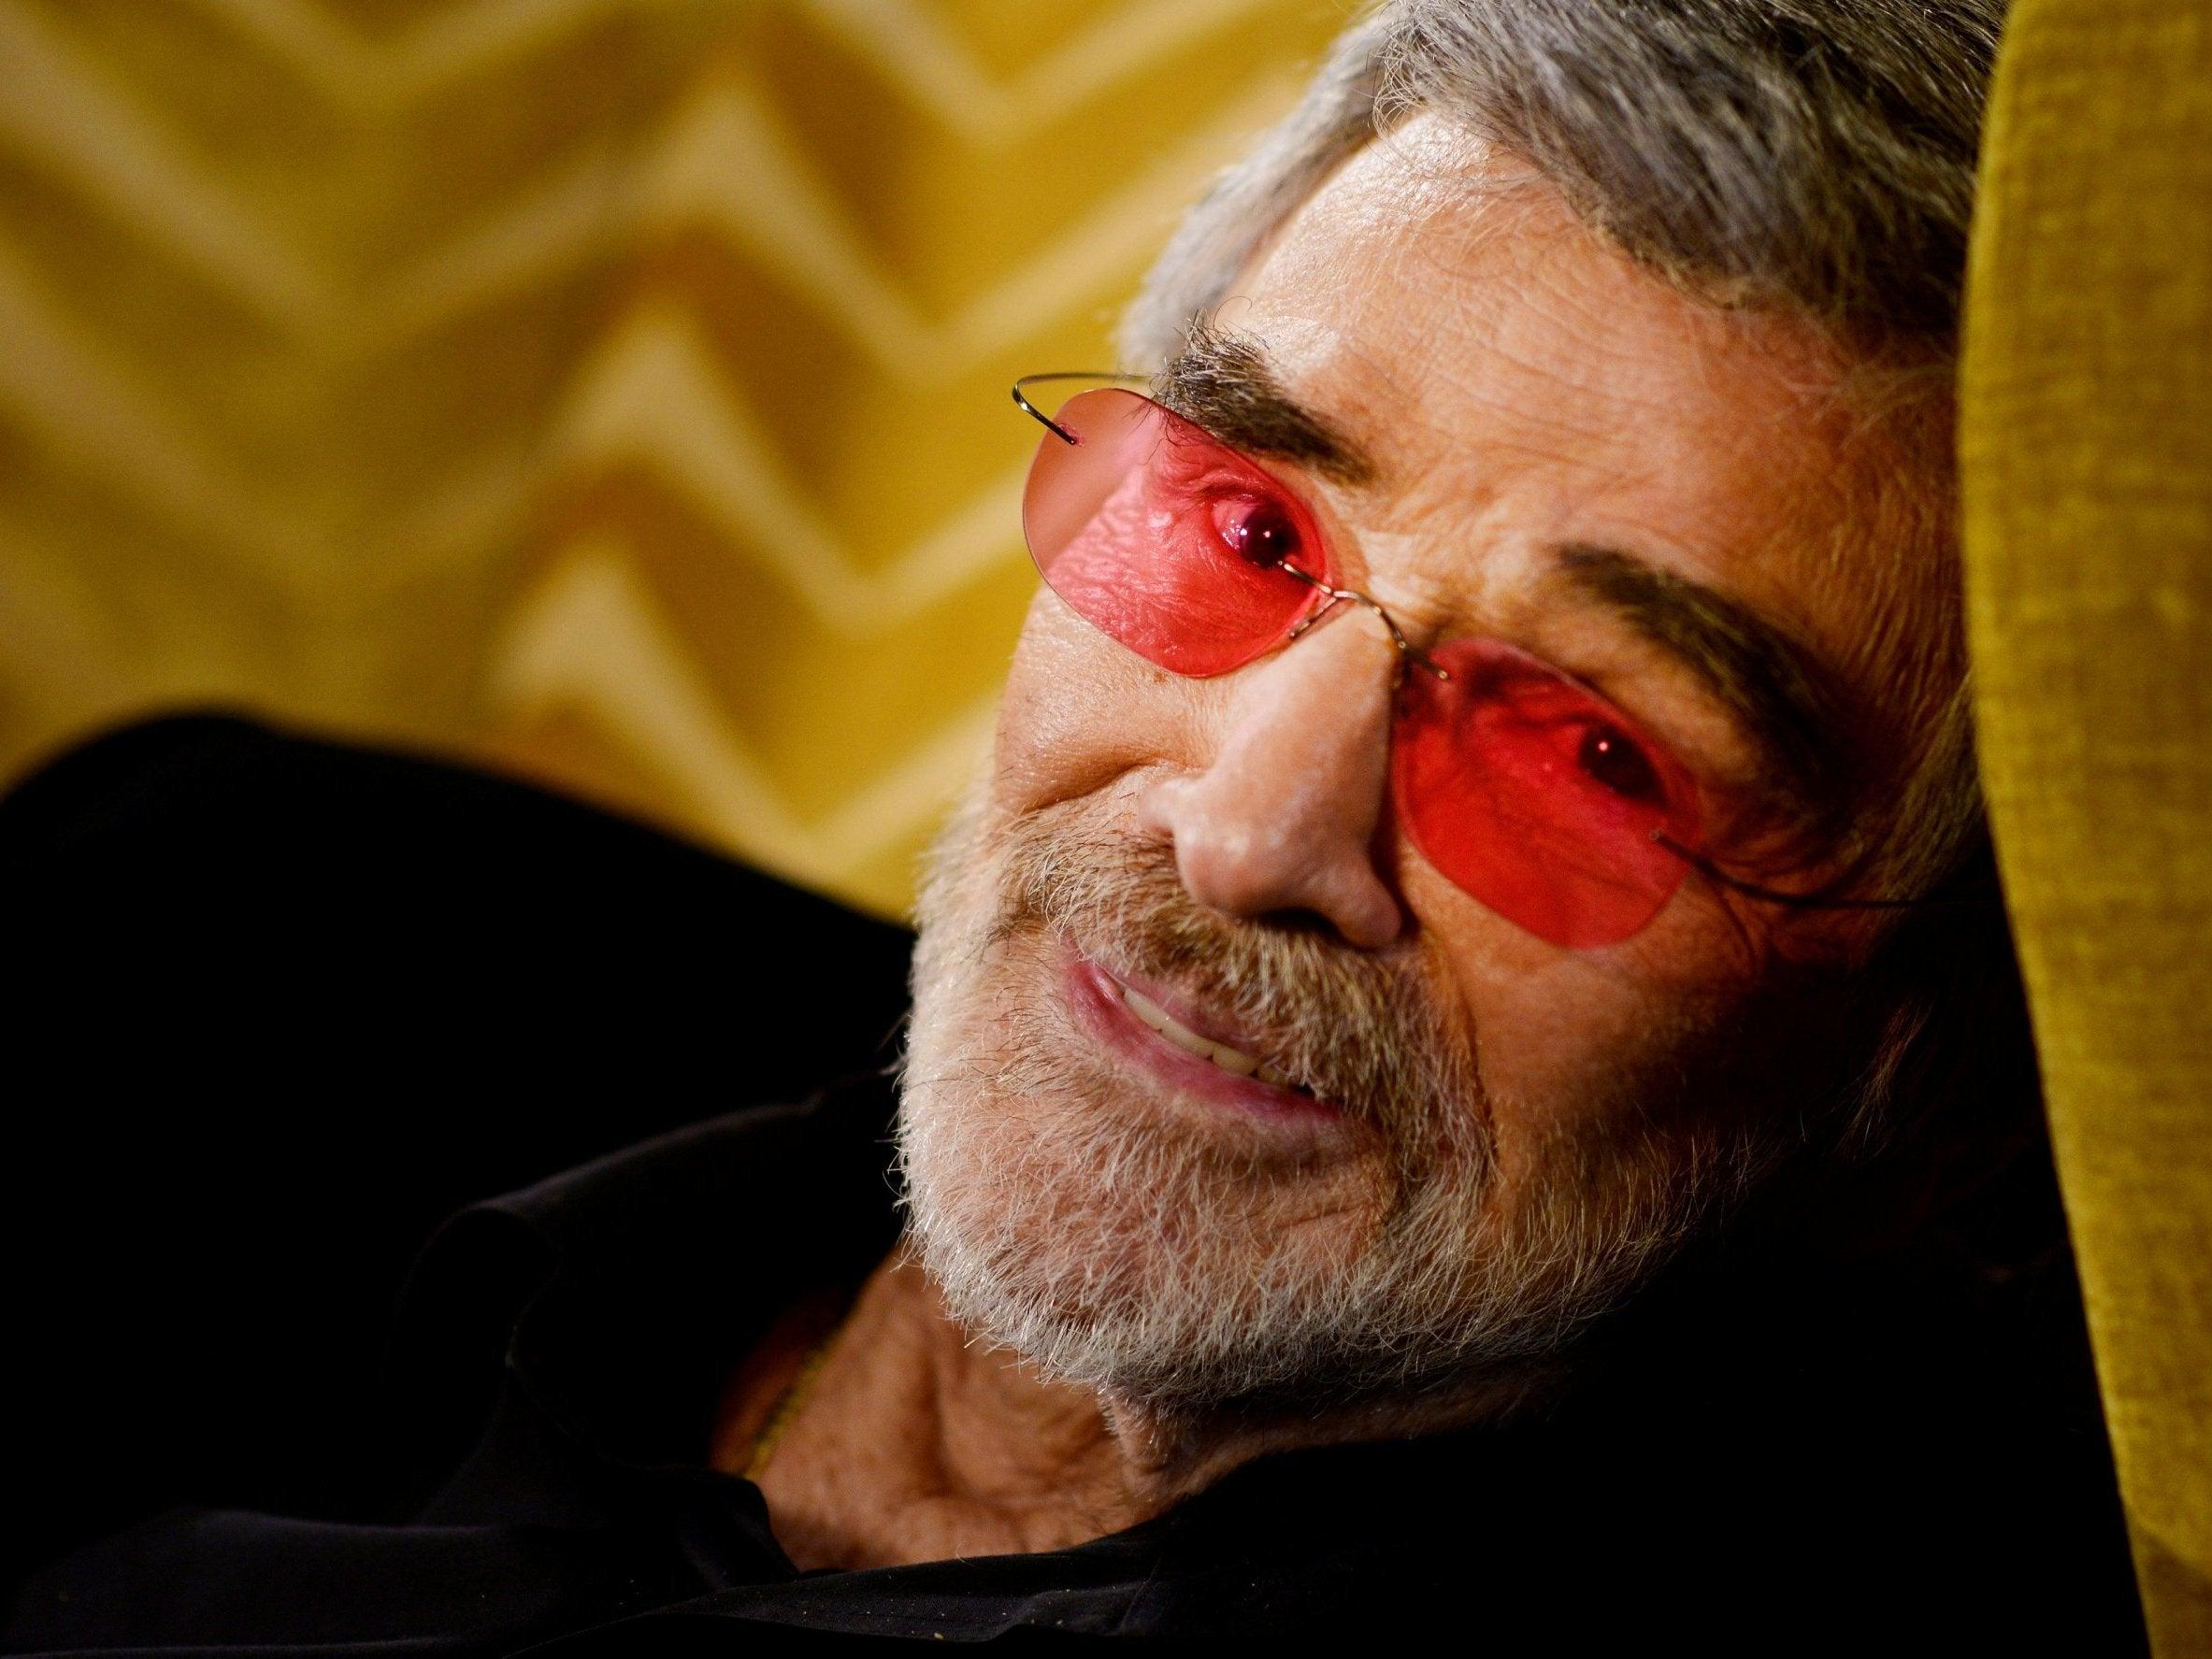 Burt Reynolds obituary: Charismatic star known for having